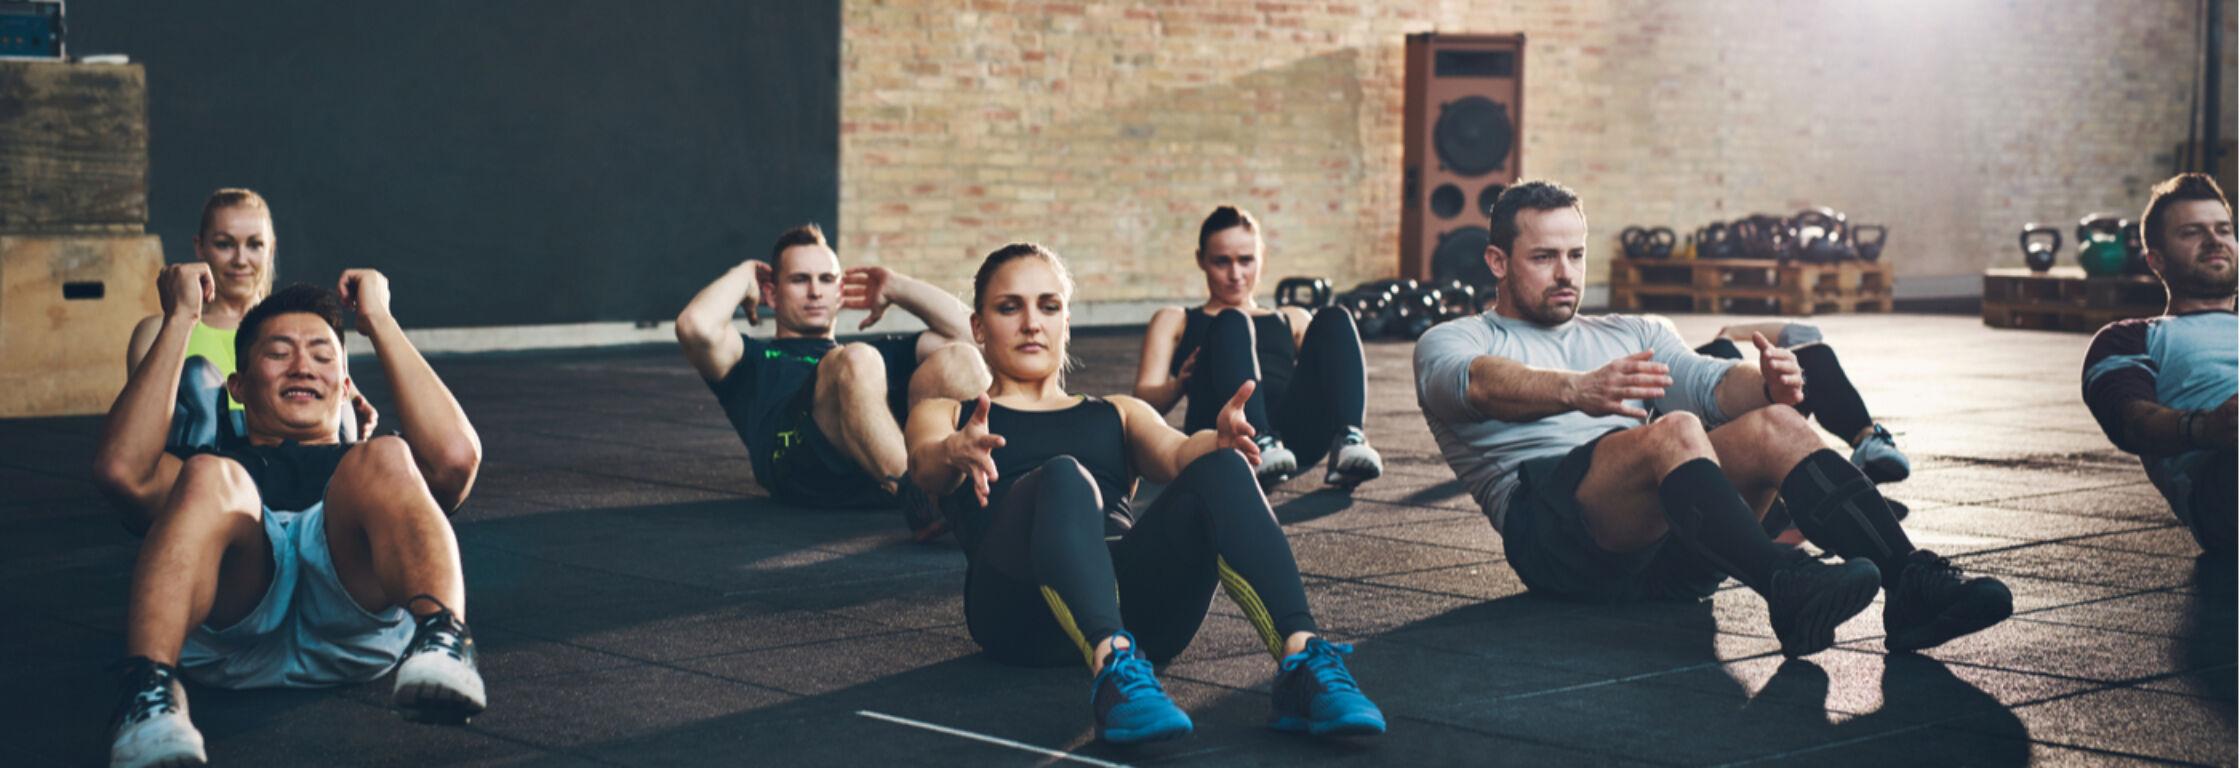 Core training: hoe pak je het aan?